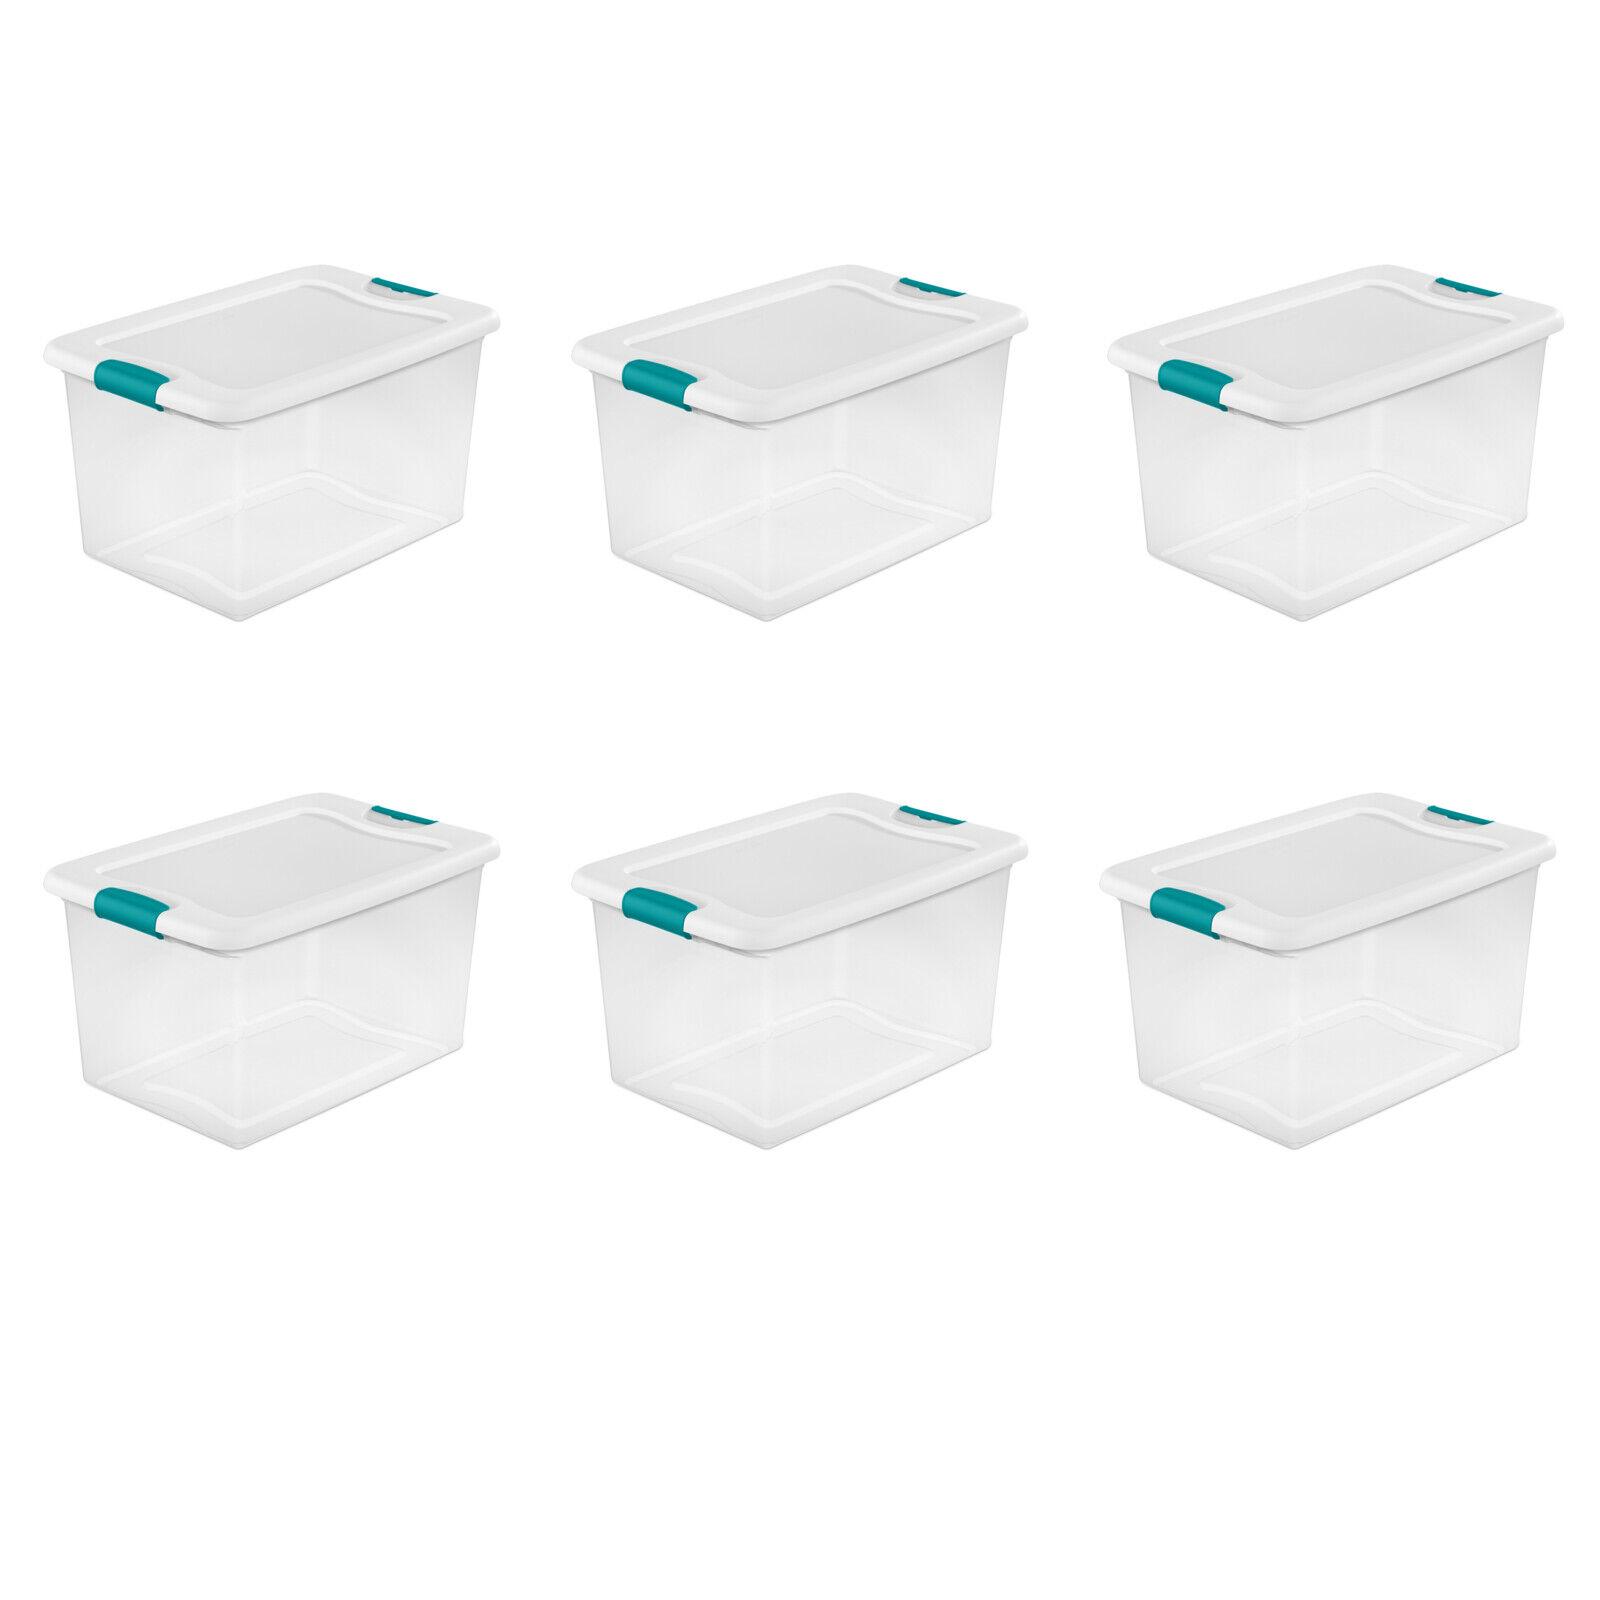 6 Pack Sterilite 64 Quart Latching Box Container Storage Lat